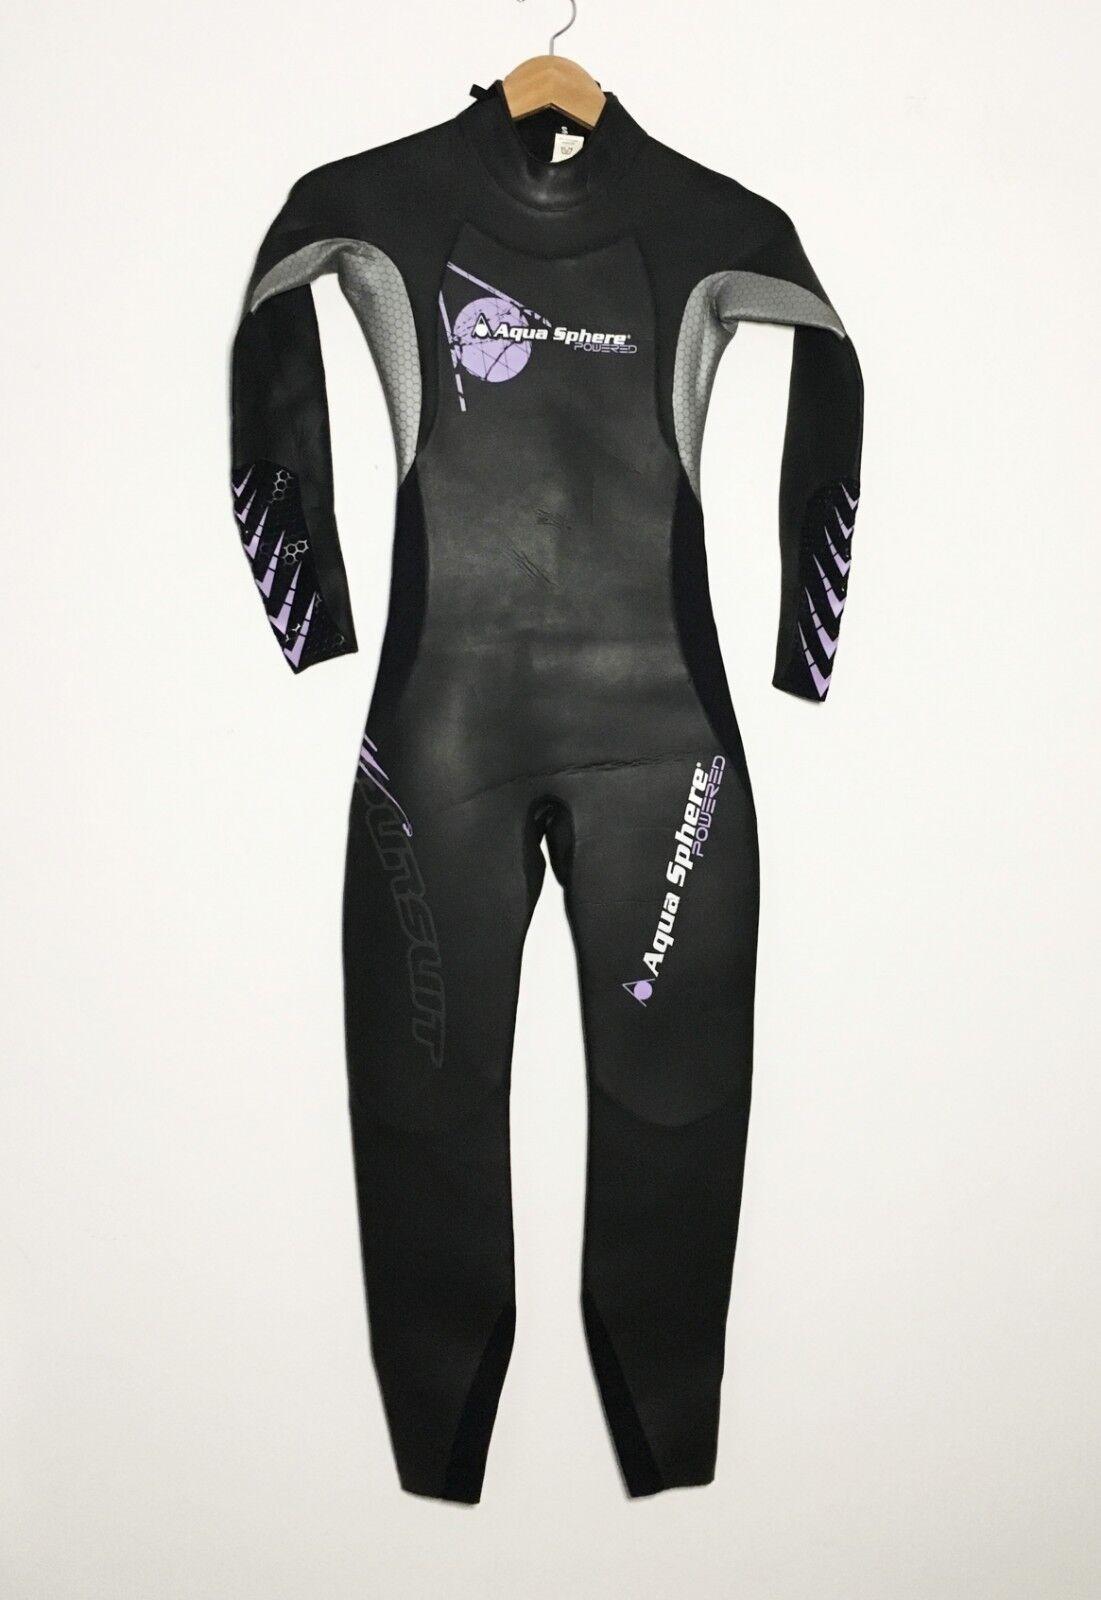 Aquasphere Womens Triathlon Wetsuit Size Small S Full Suit